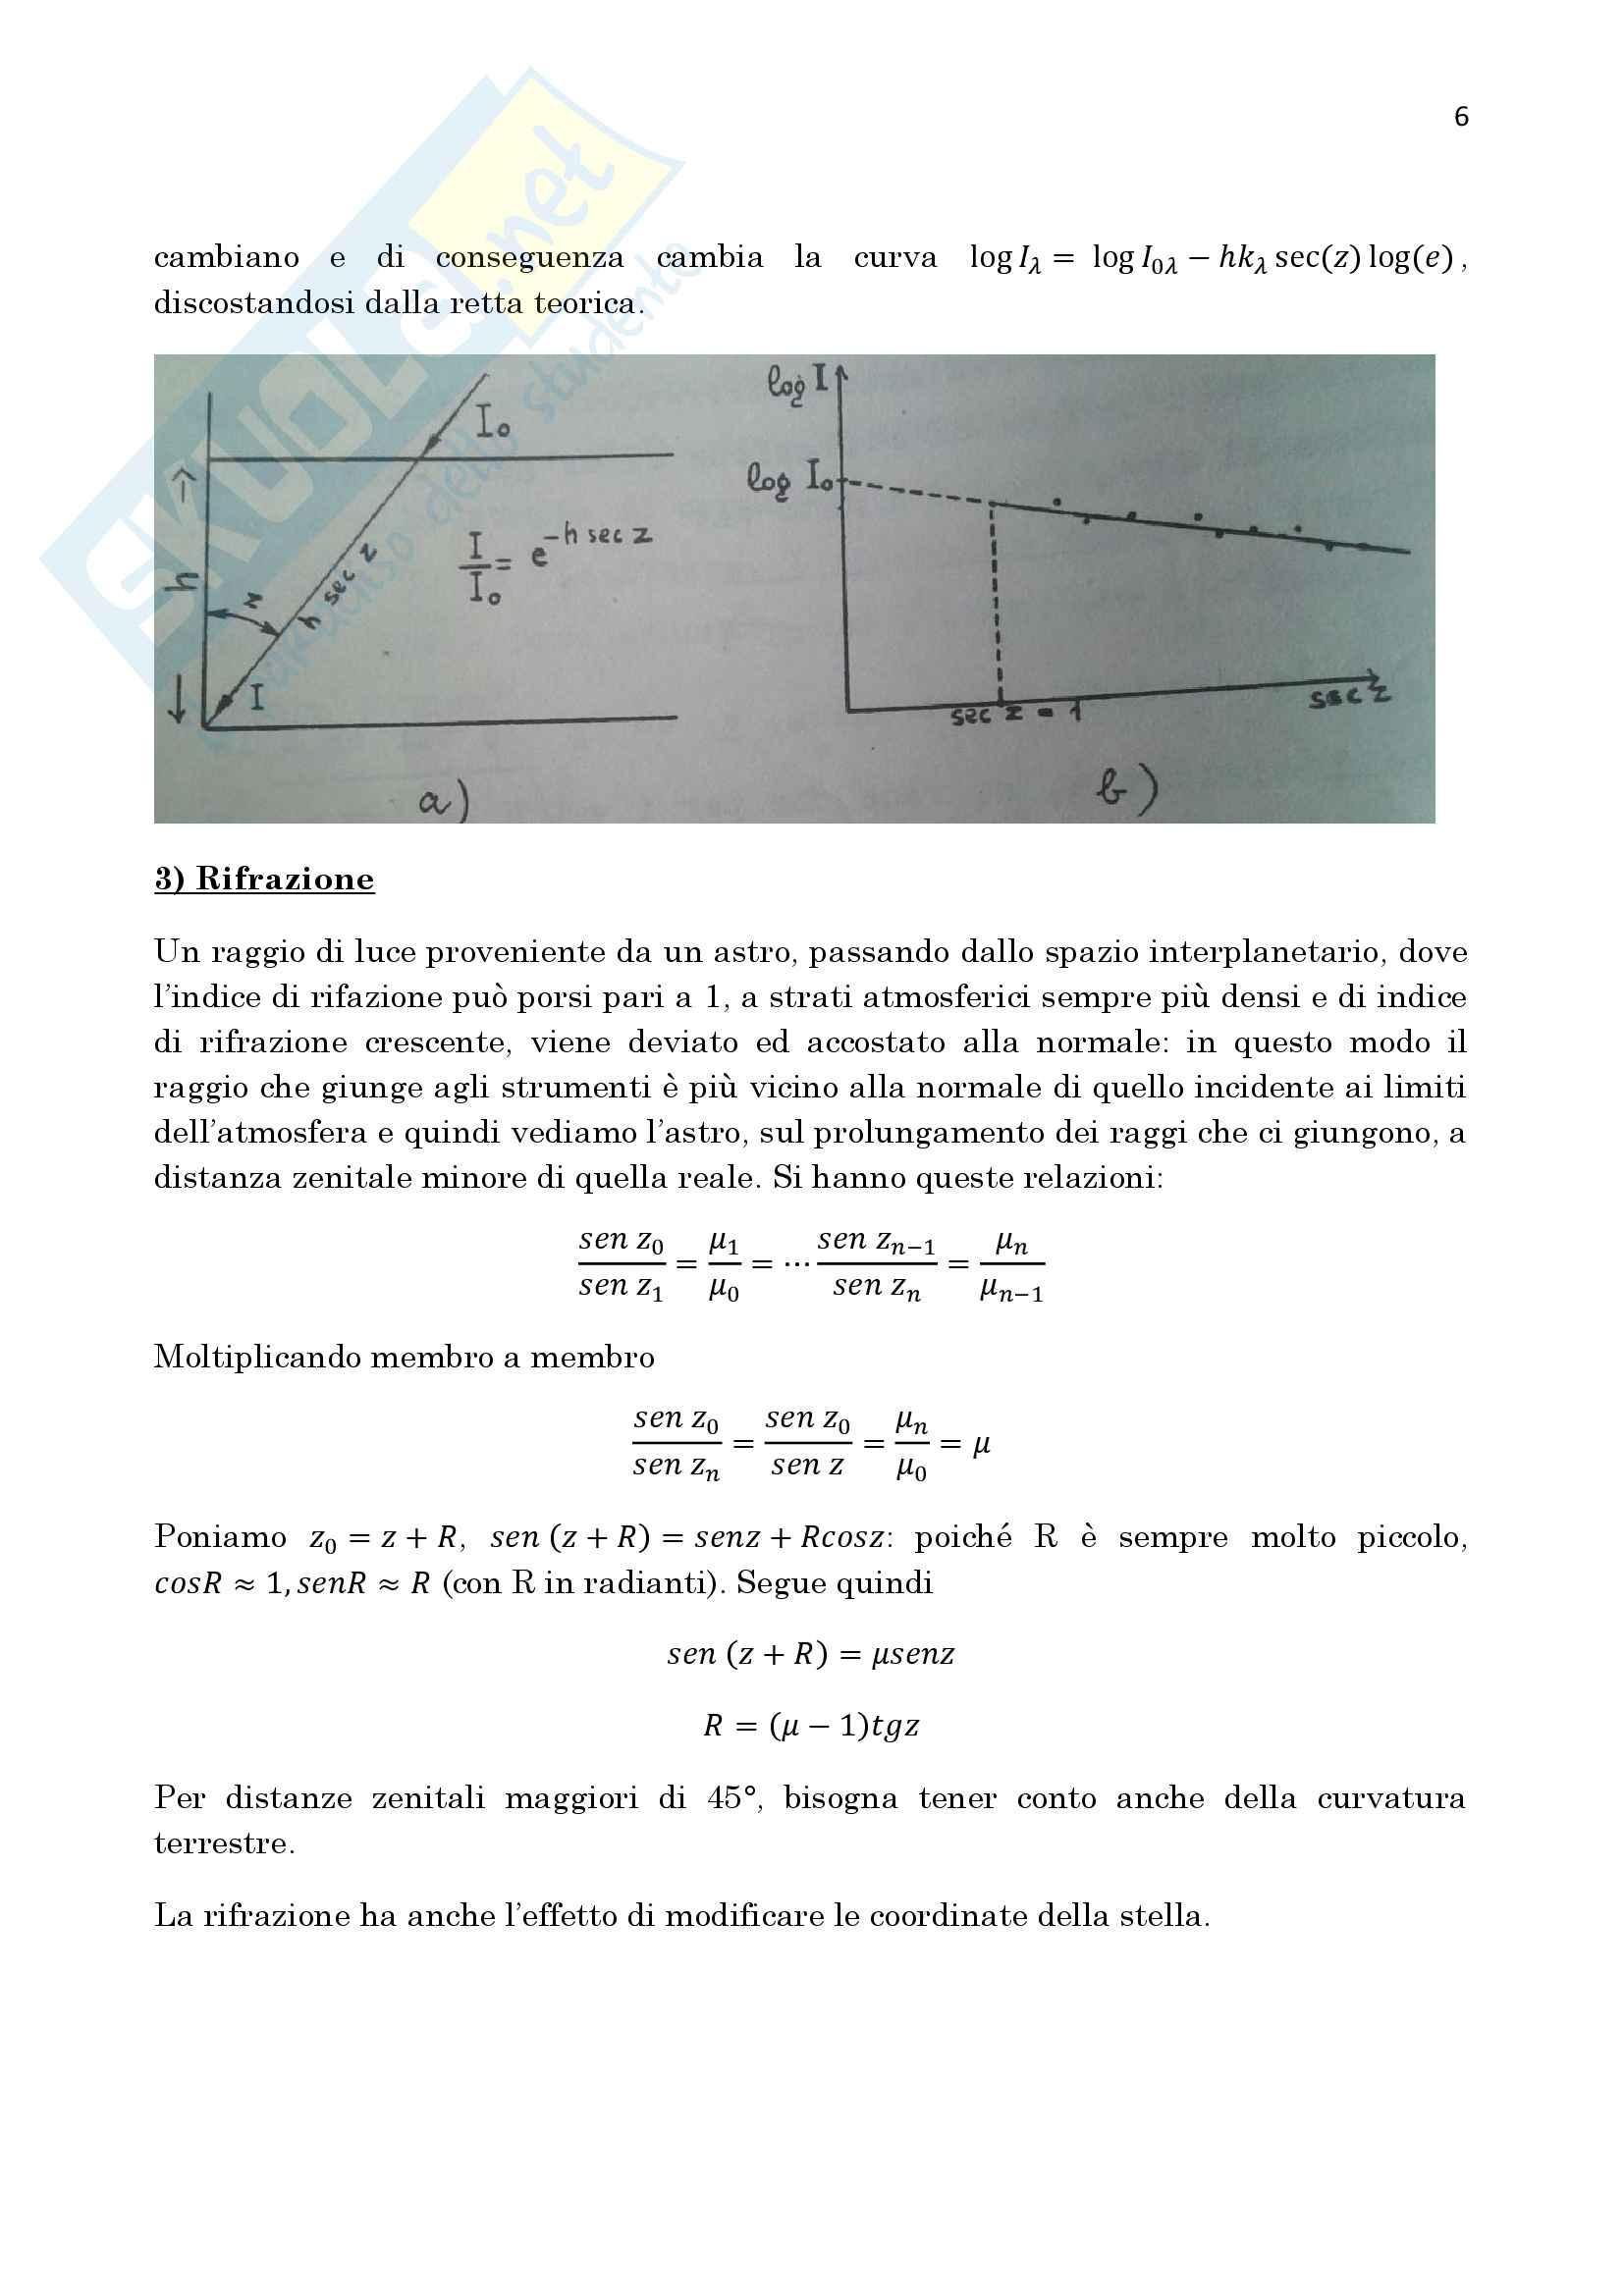 Astronomia Pag. 6